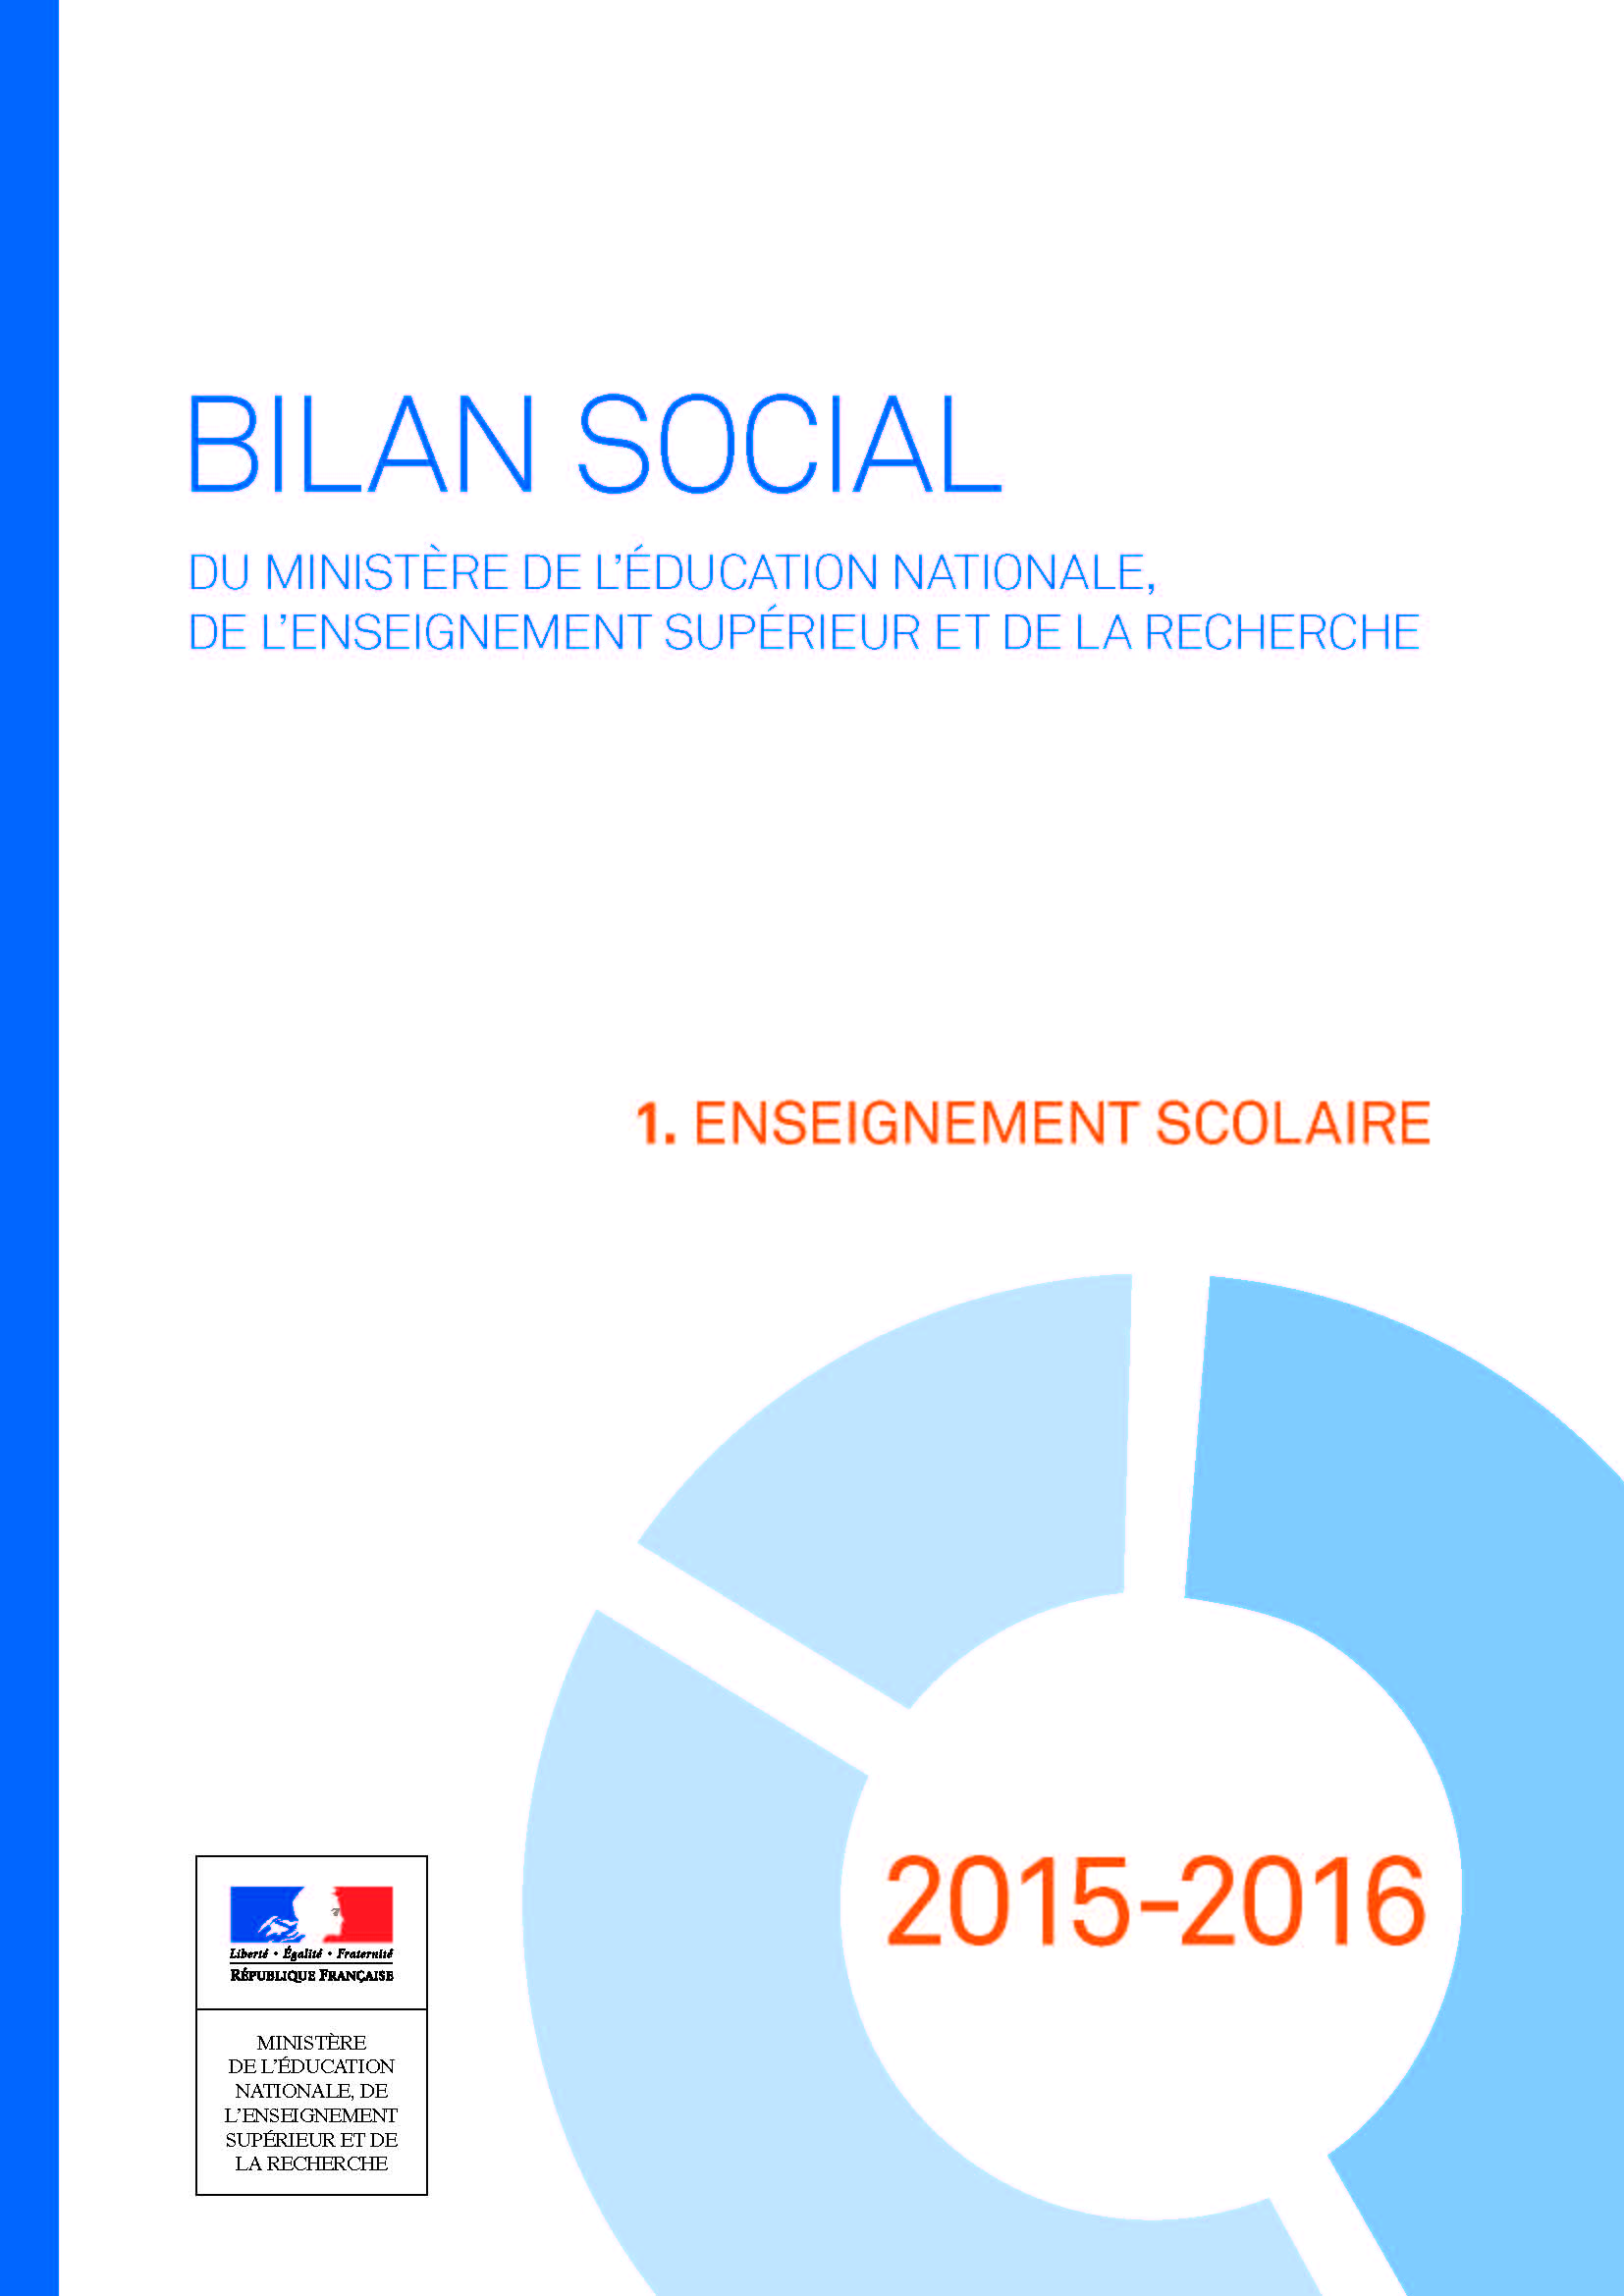 Bilan social 2015-2016